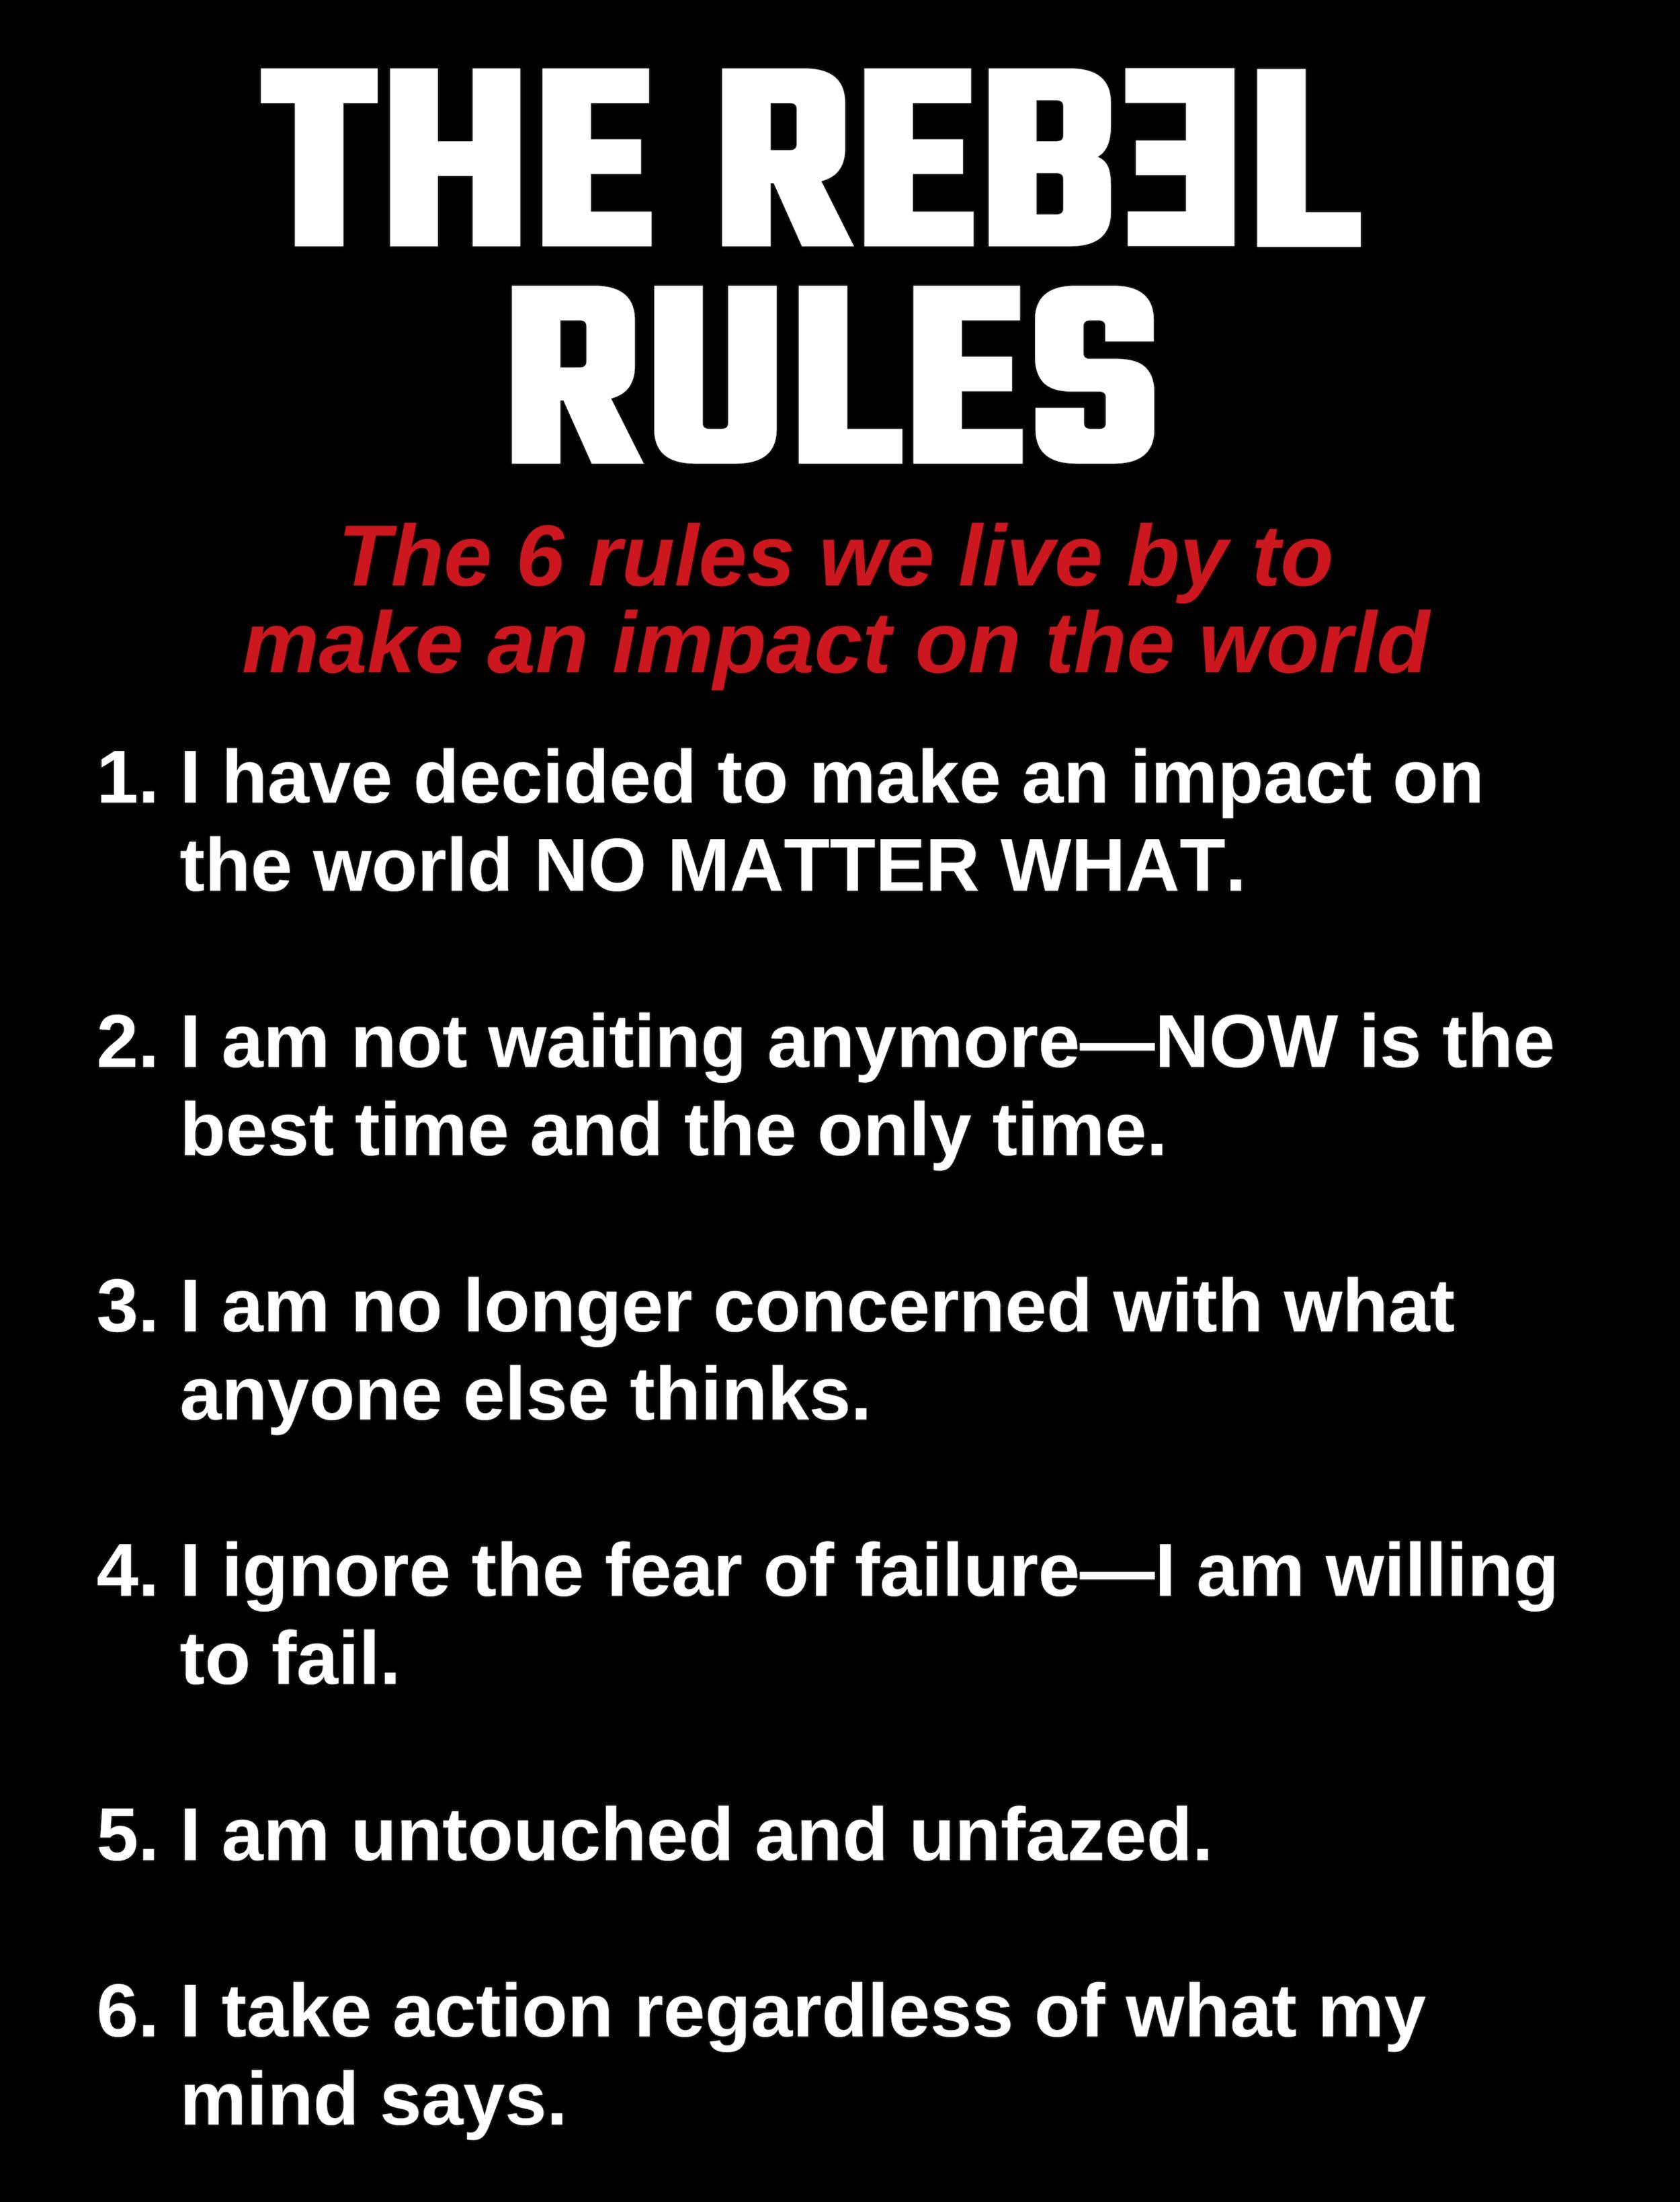 Rebel Rules for life coaching, life coaches, life coach school, life coach certification